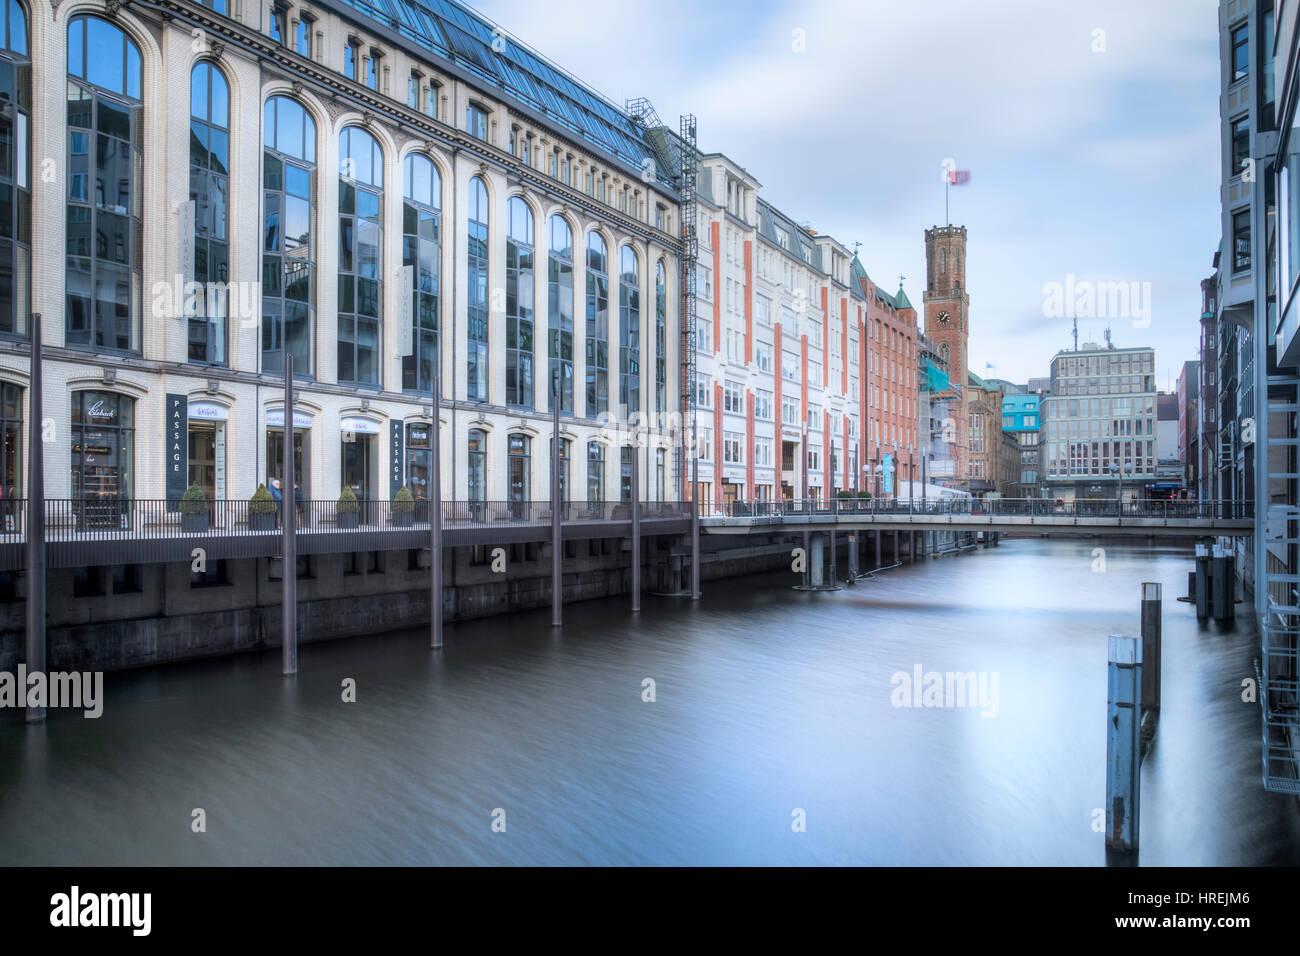 Bleichenfleet, Hamburg, Germany, Europe - Stock Image